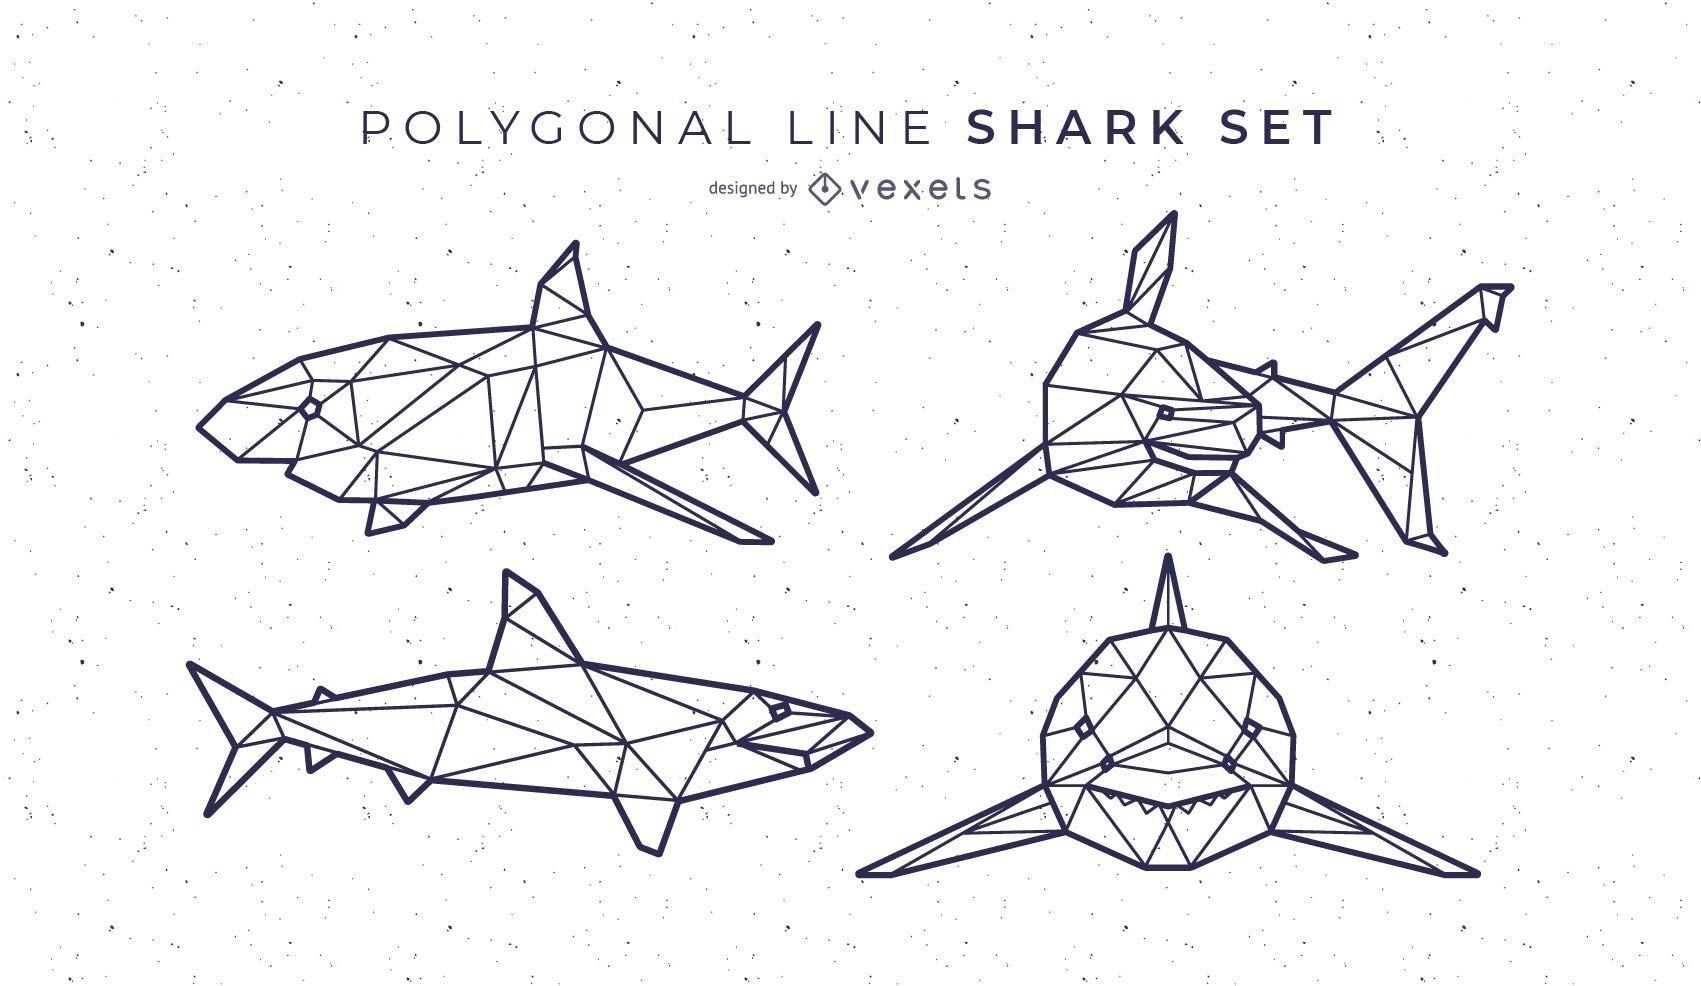 Shark Polygonal Line Set